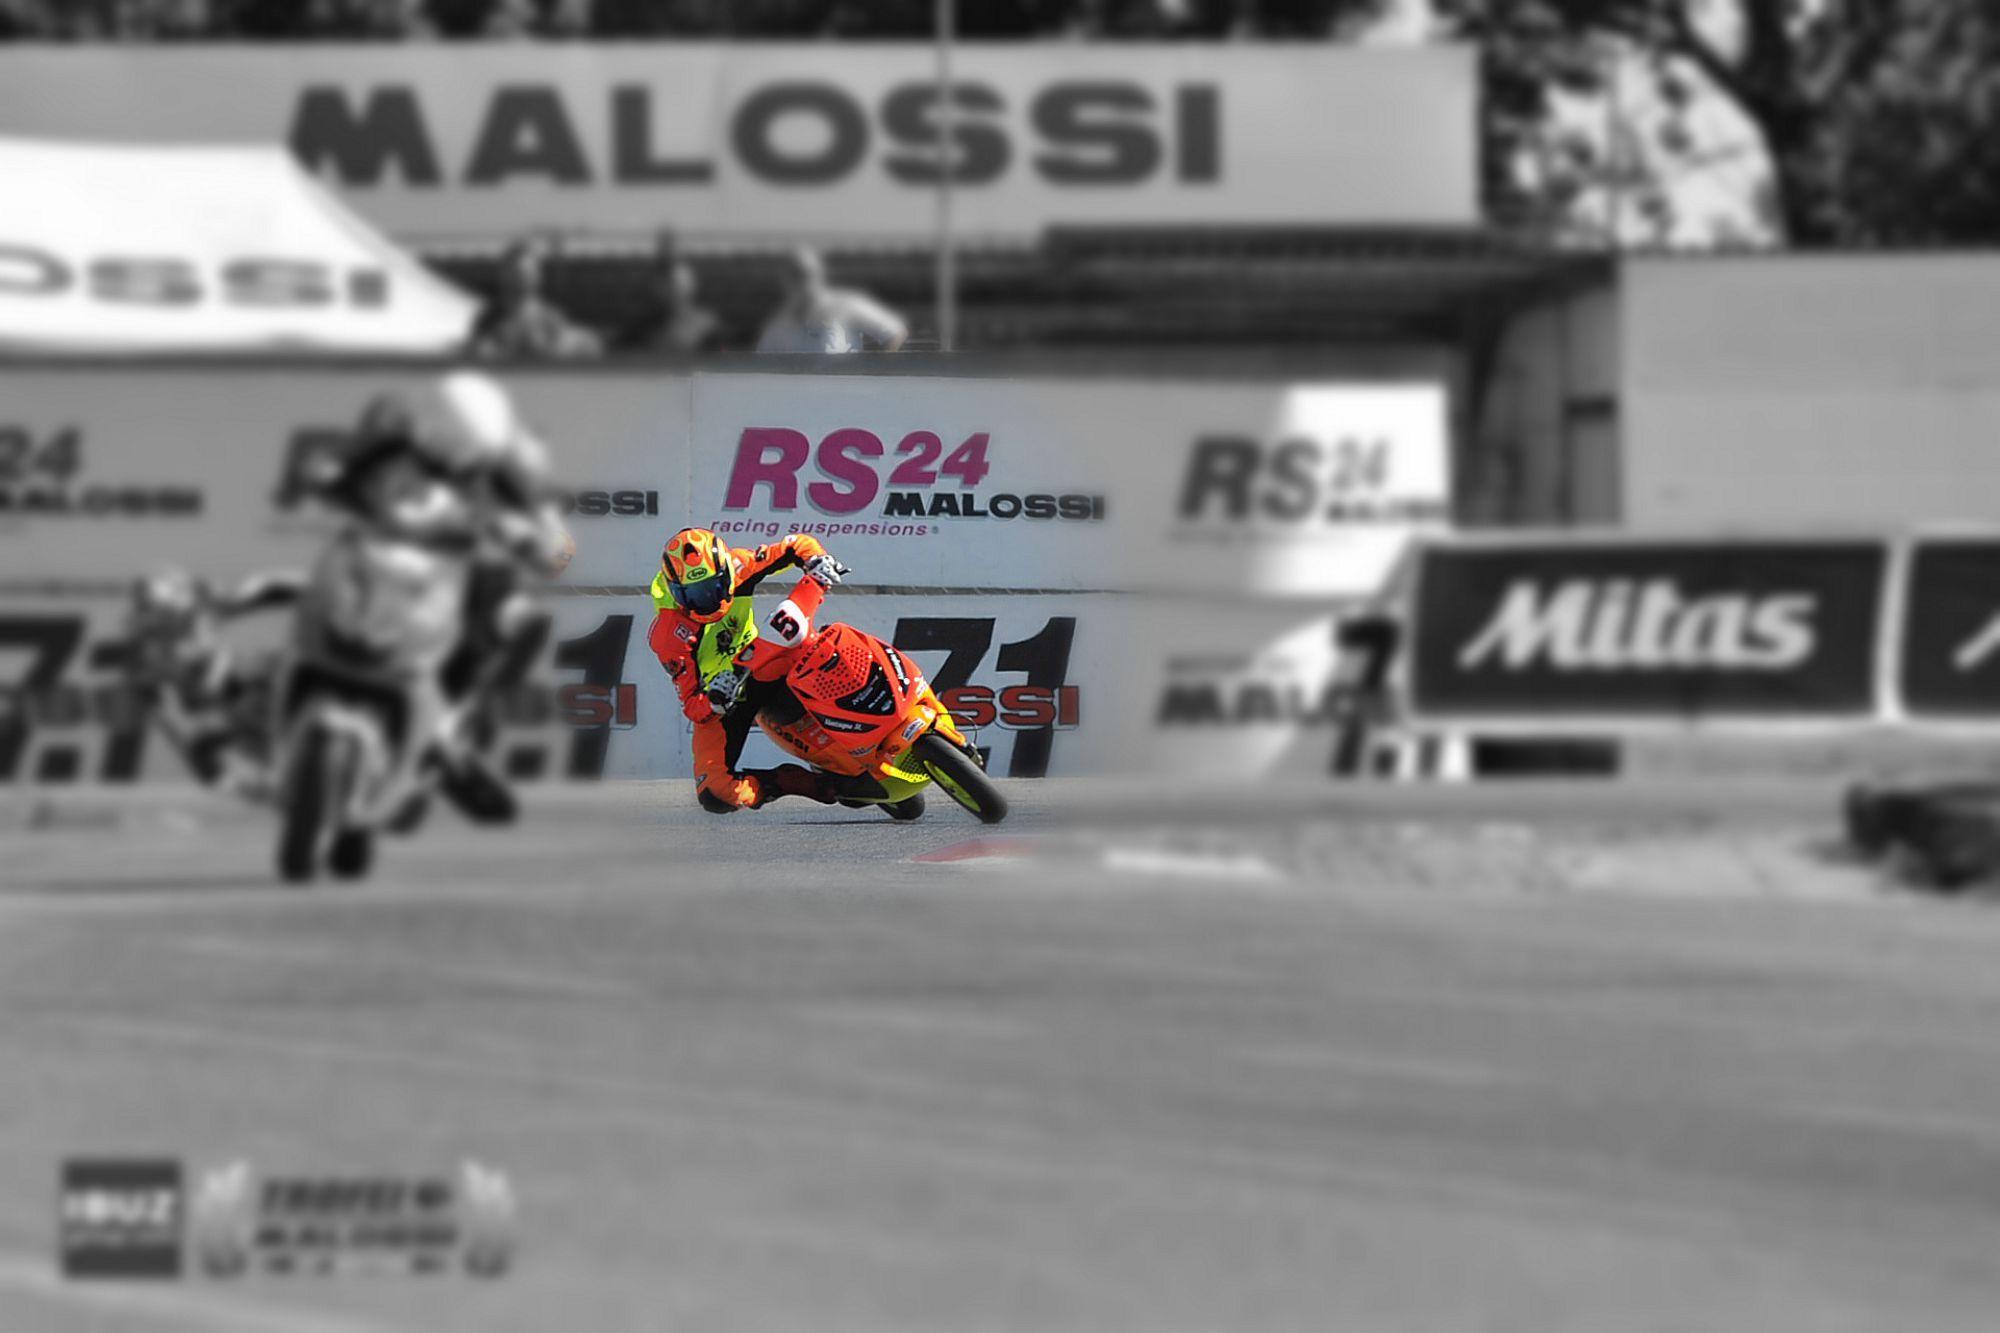 Circuito Vallelunga : Campionato italiano gt u round u vallelunga